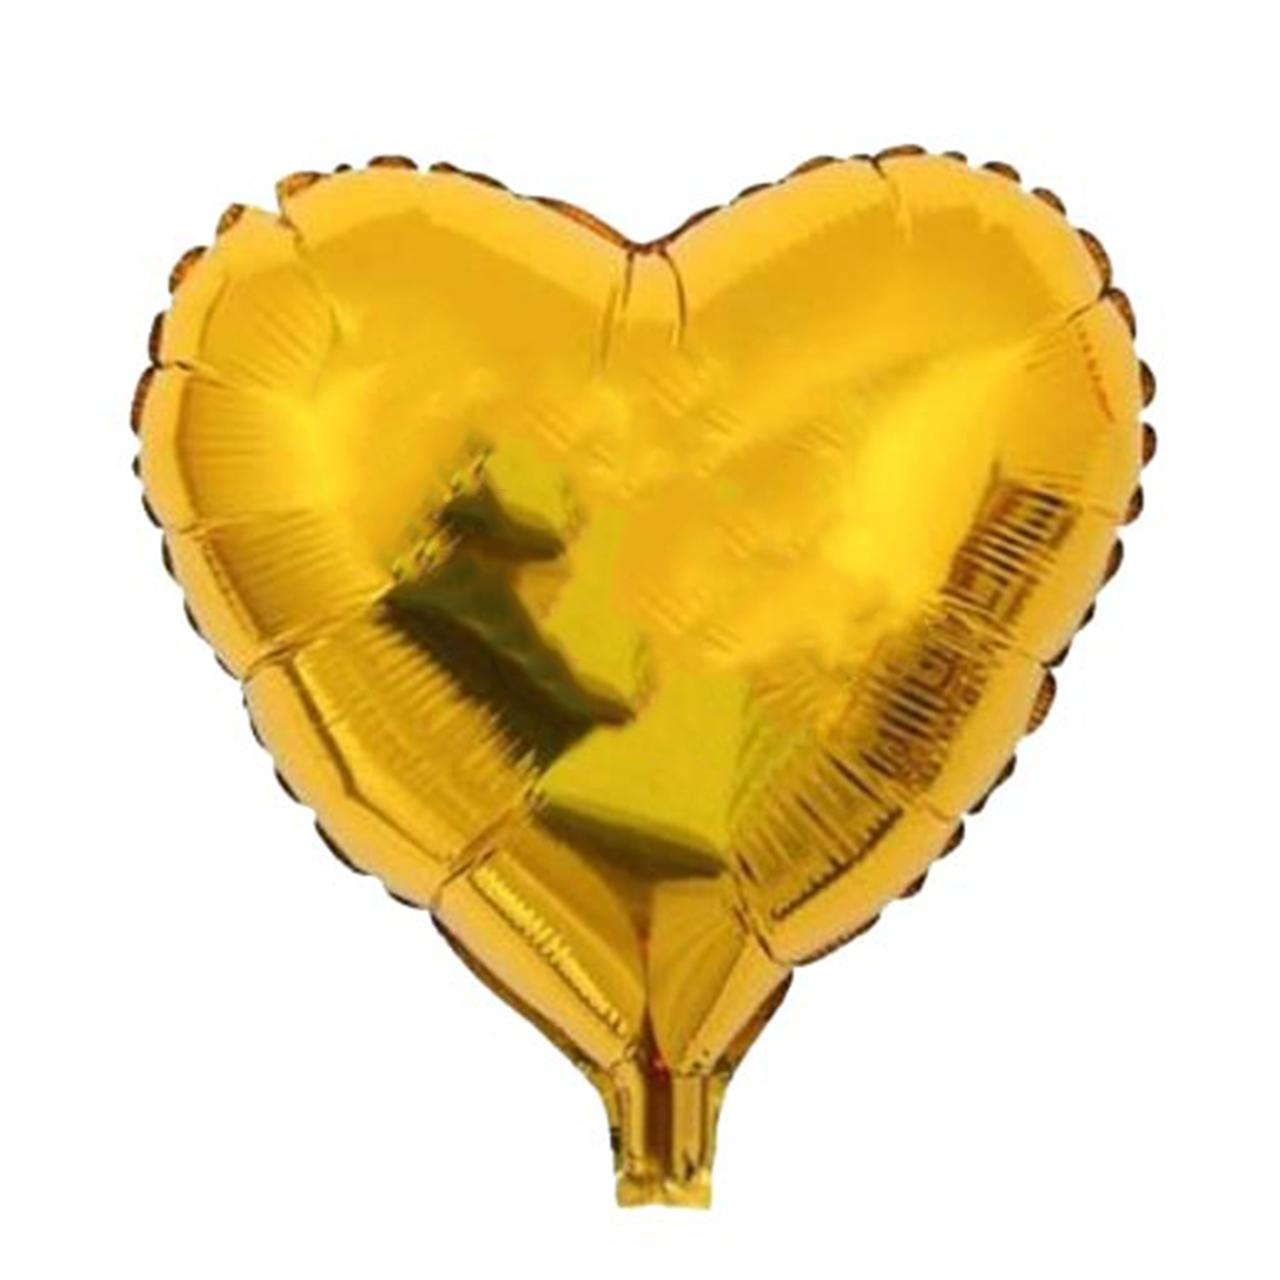 بادکنک فویلی مدل قلب طلایی سایز 120